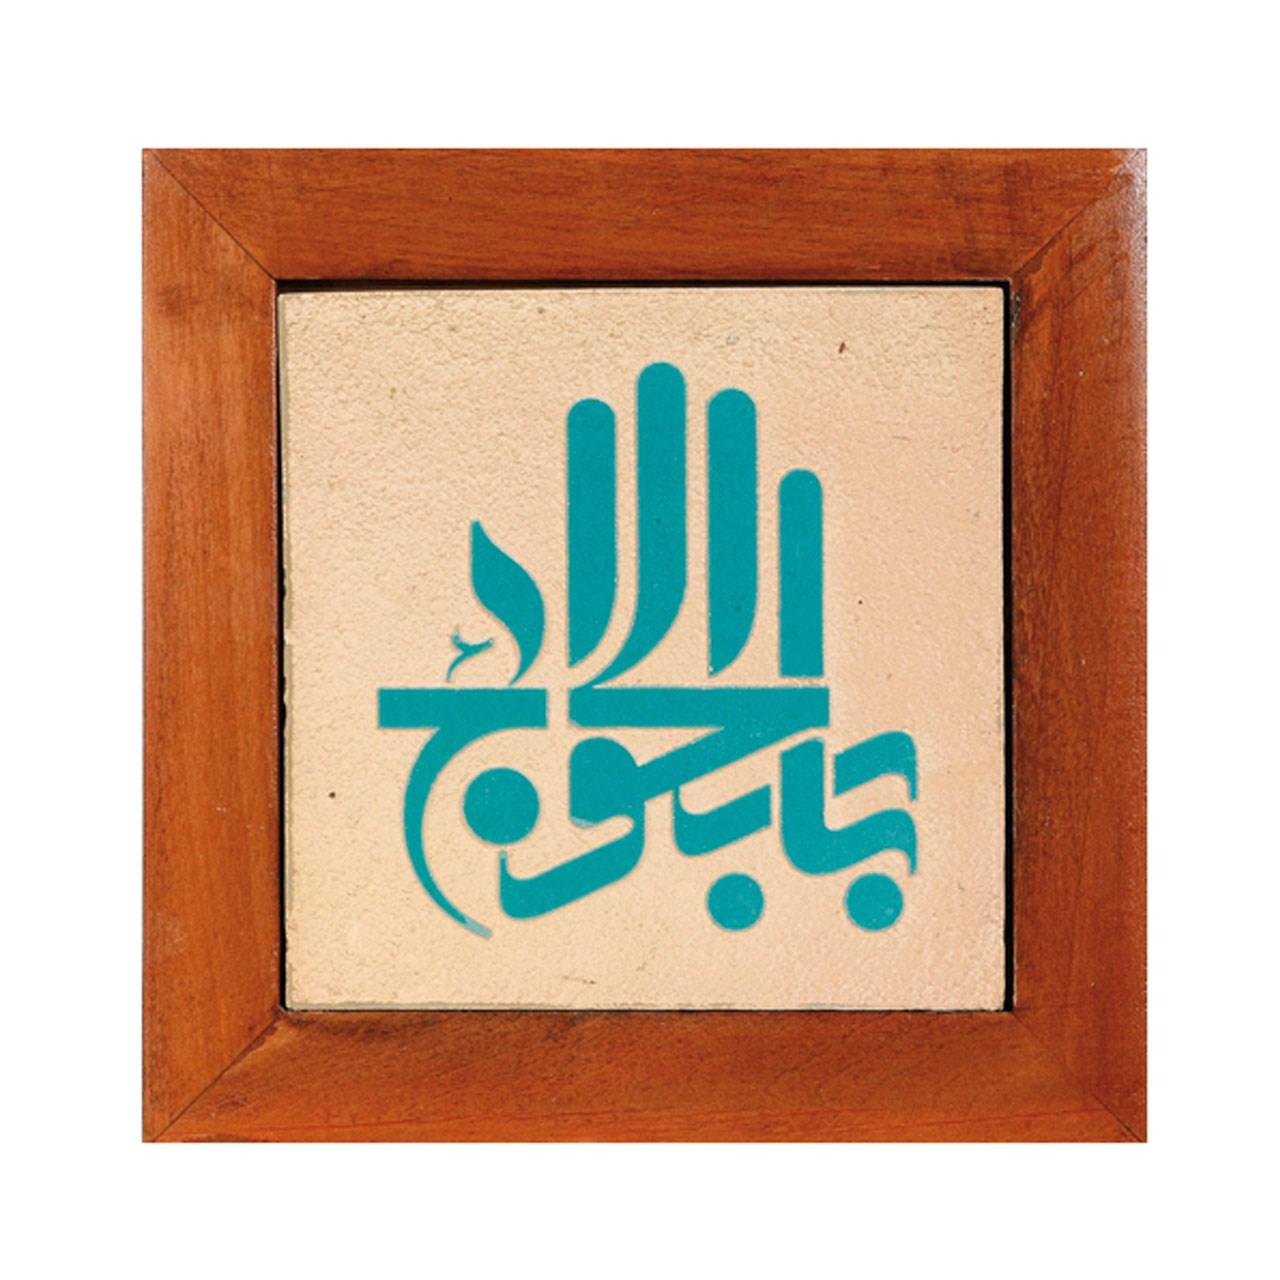 تابلو کاشی سلام مجموعه جلی طرح باب الحوائج